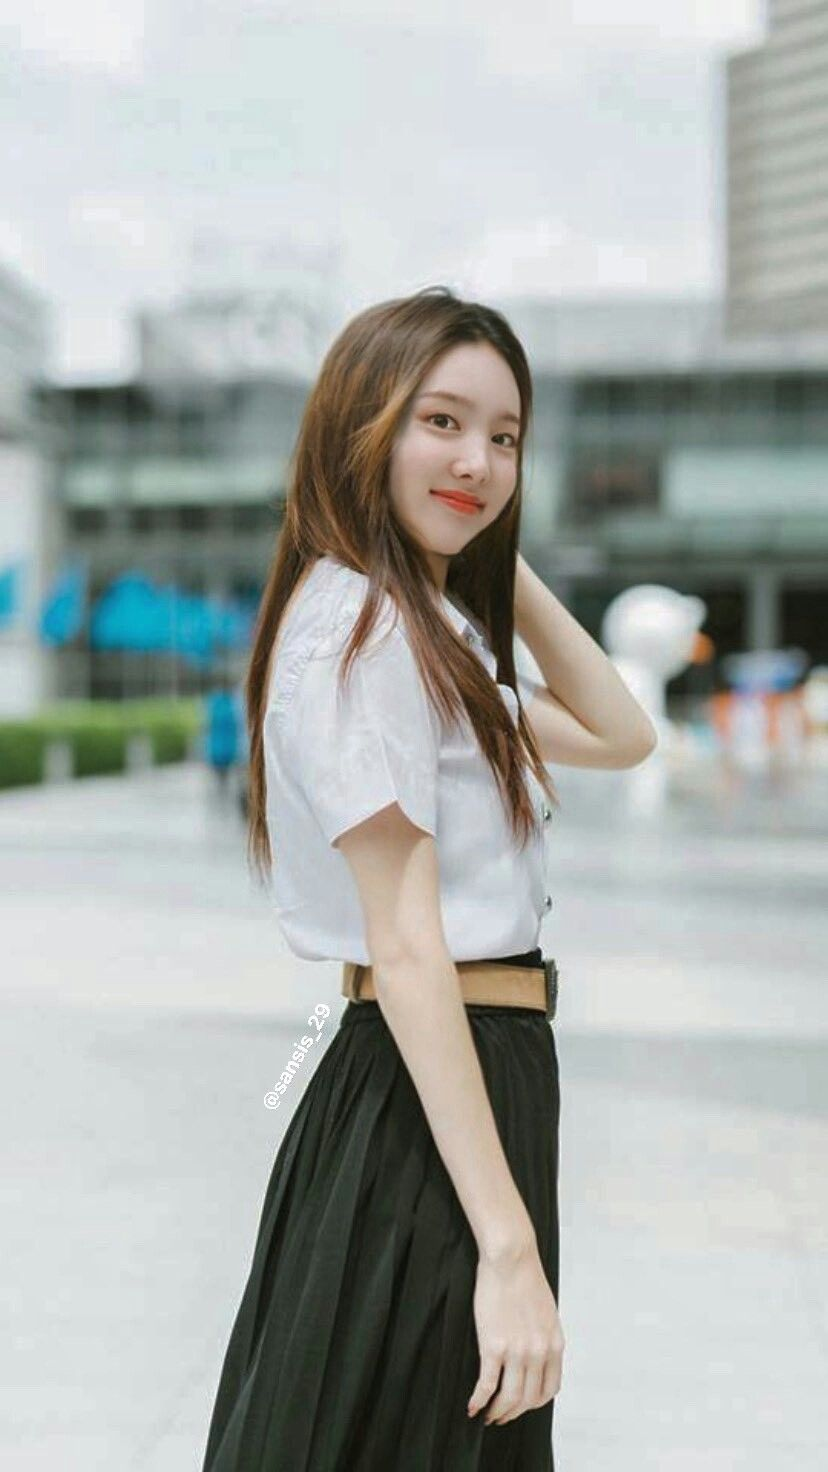 Pin Oleh Changkyun Eeeheheuehdhehedj Di Im Nayeon Di 2020 Wanita Selebritas Kelahiran